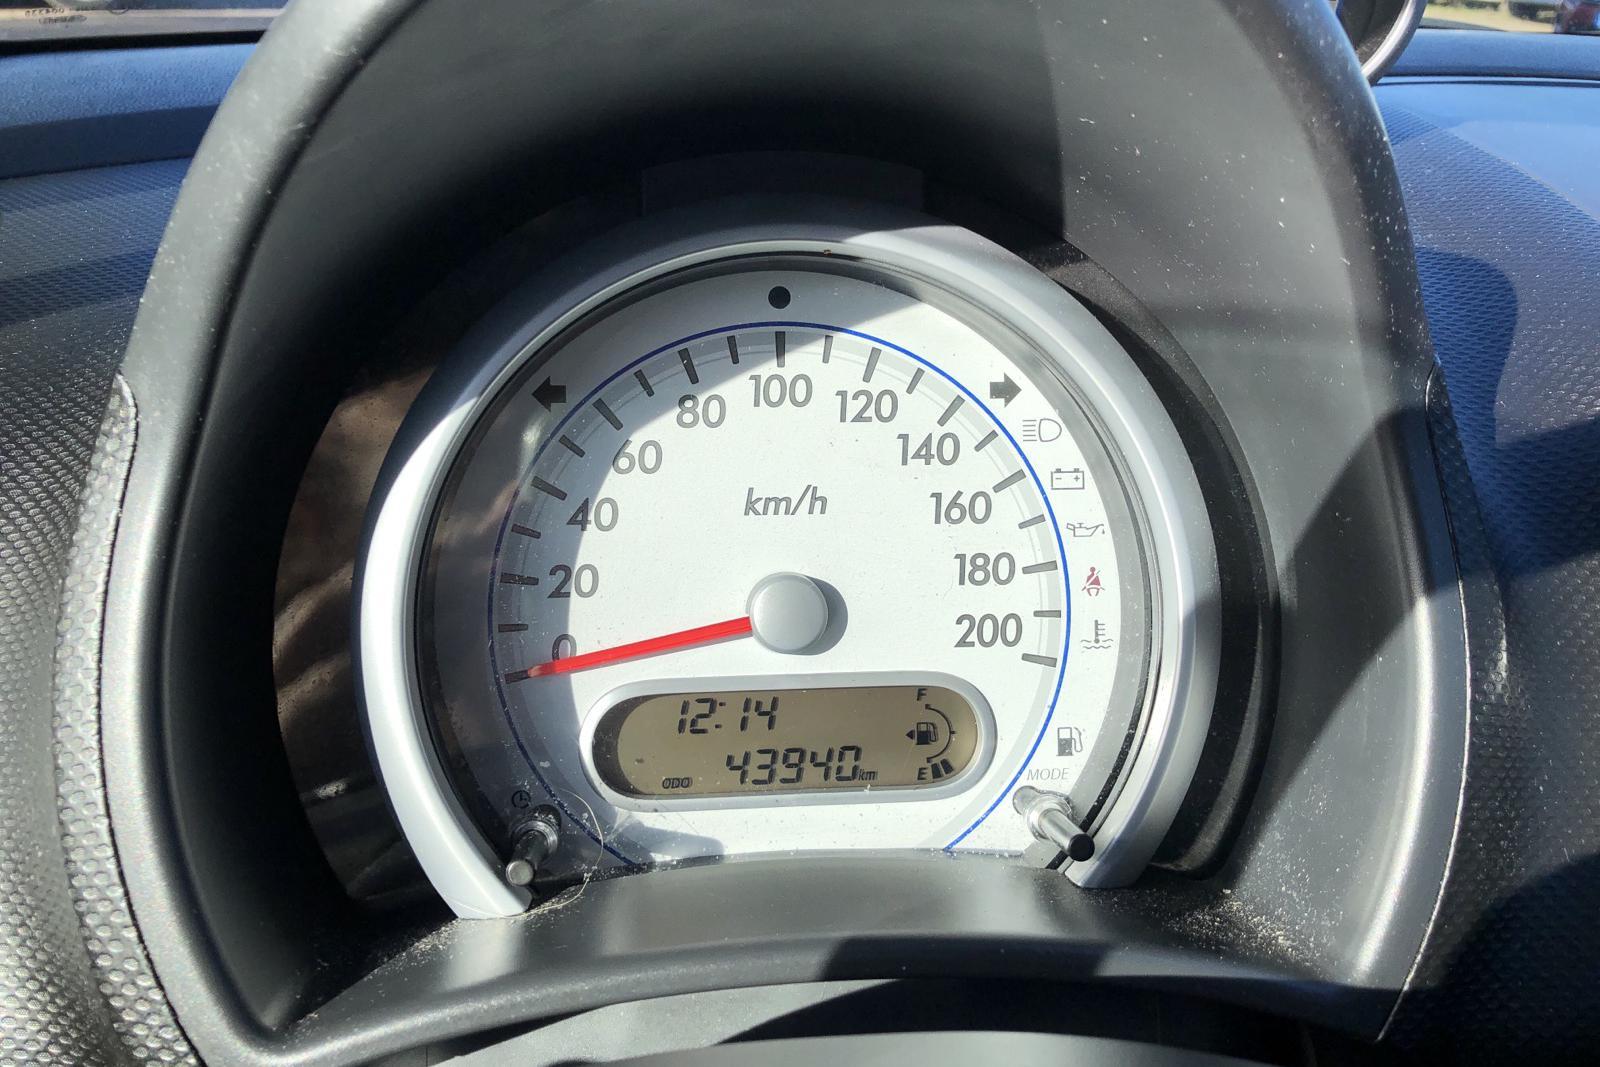 Suzuki Splash 1.0 (65hk) - 4 394 mil - Manuell - röd - 2010